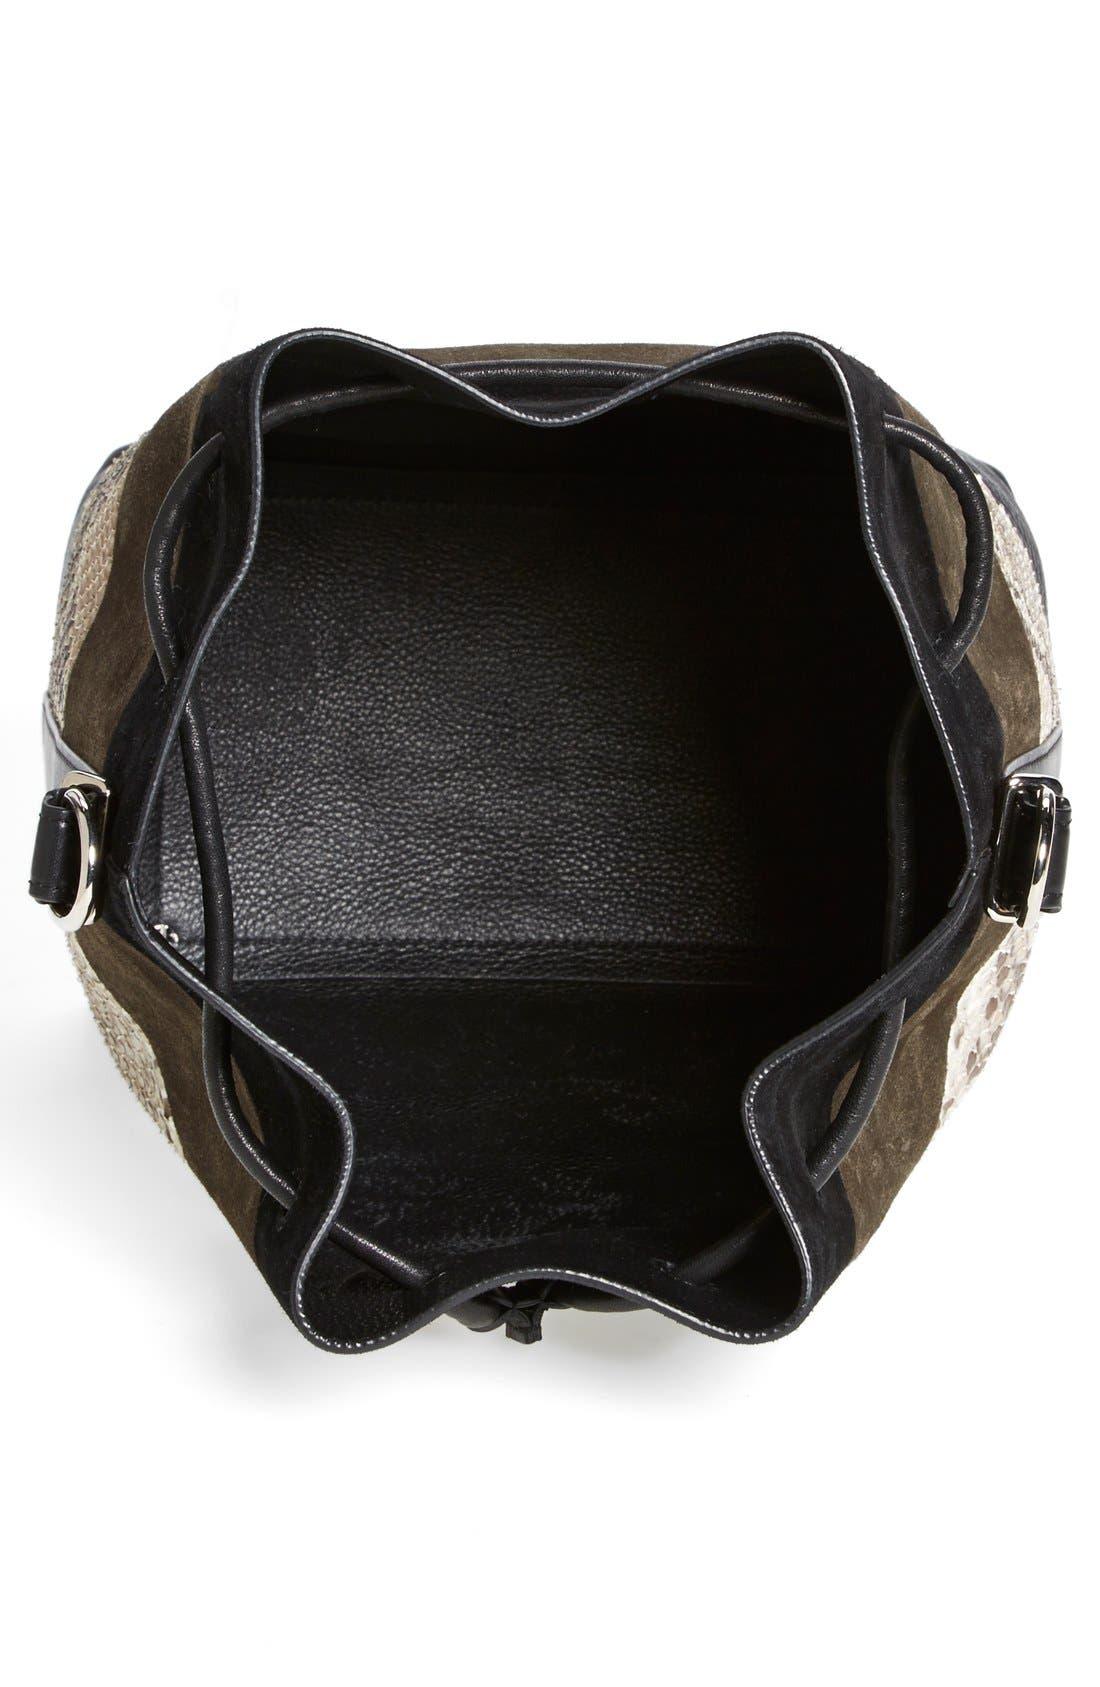 Alternate Image 2  - Proenza Schouler 'Medium' Suede & Genuine Snakeskin Bucket Bag